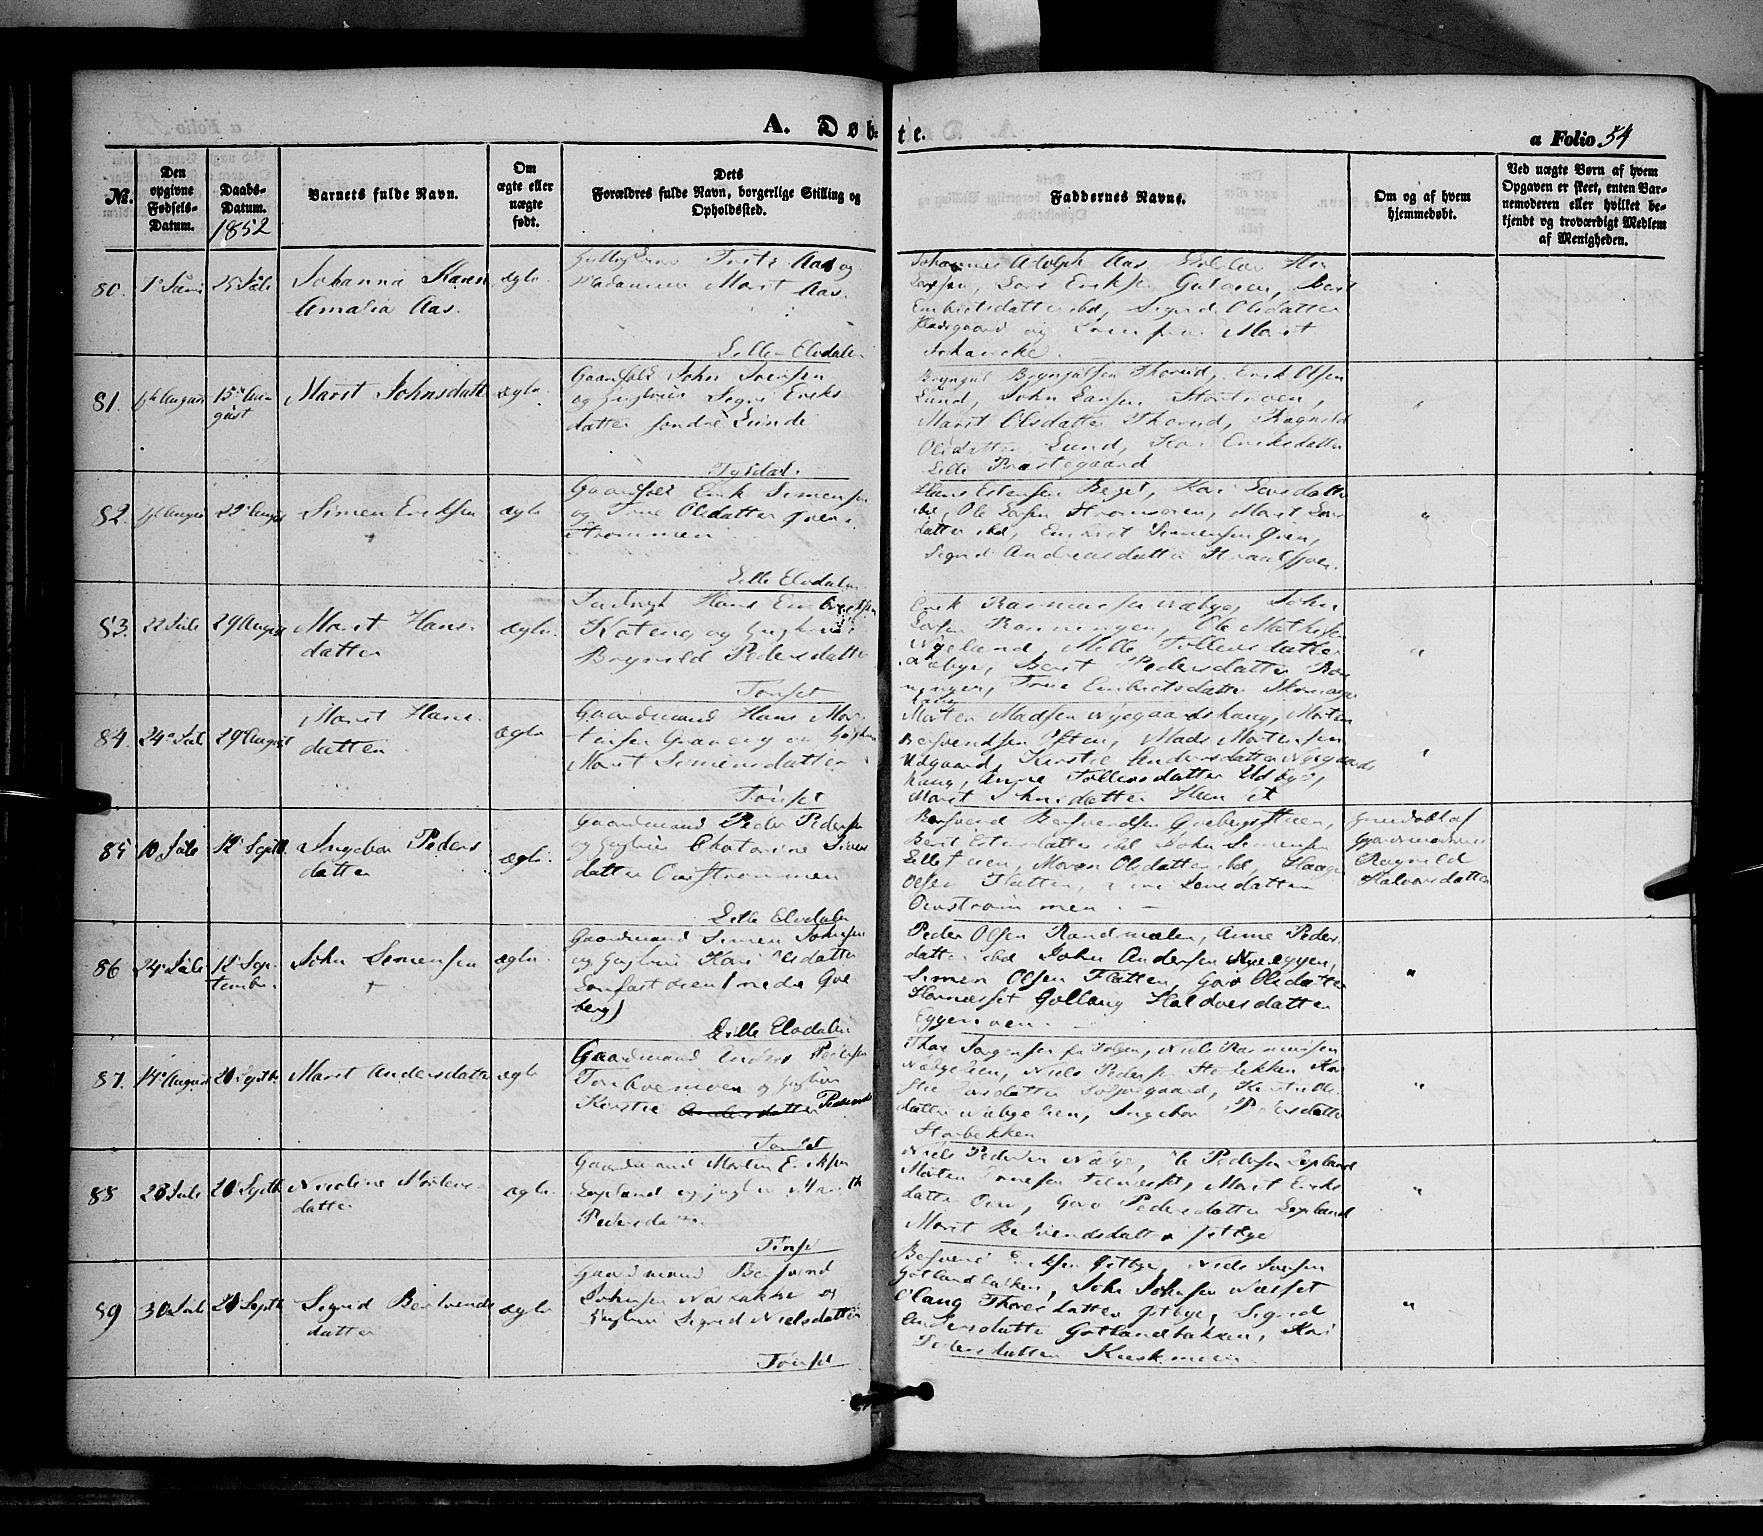 SAH, Tynset prestekontor, Ministerialbok nr. 20, 1848-1862, s. 54